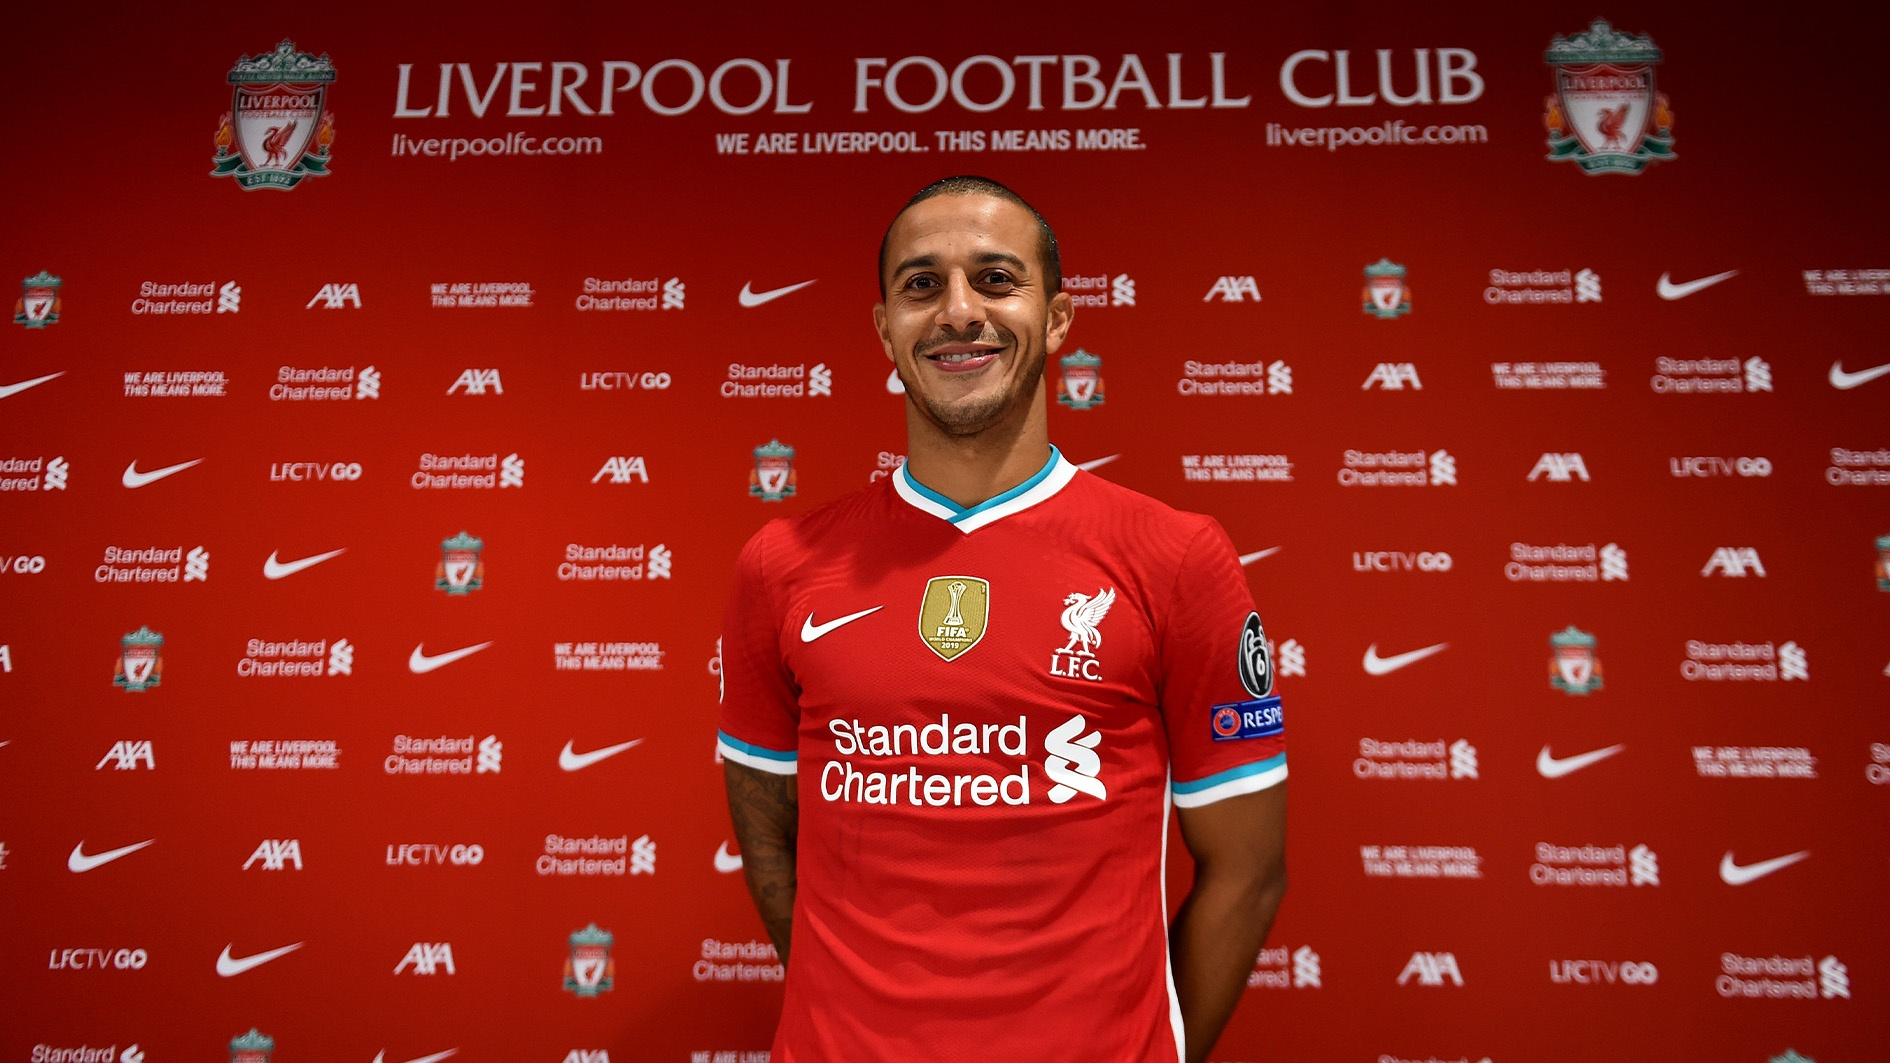 Thiago,  Liverpool,  Premier League,  Juergen Klopp,  Champions League,  Bayern,  Man United,  Chelsea,  Arsenal,  Barca anh 3